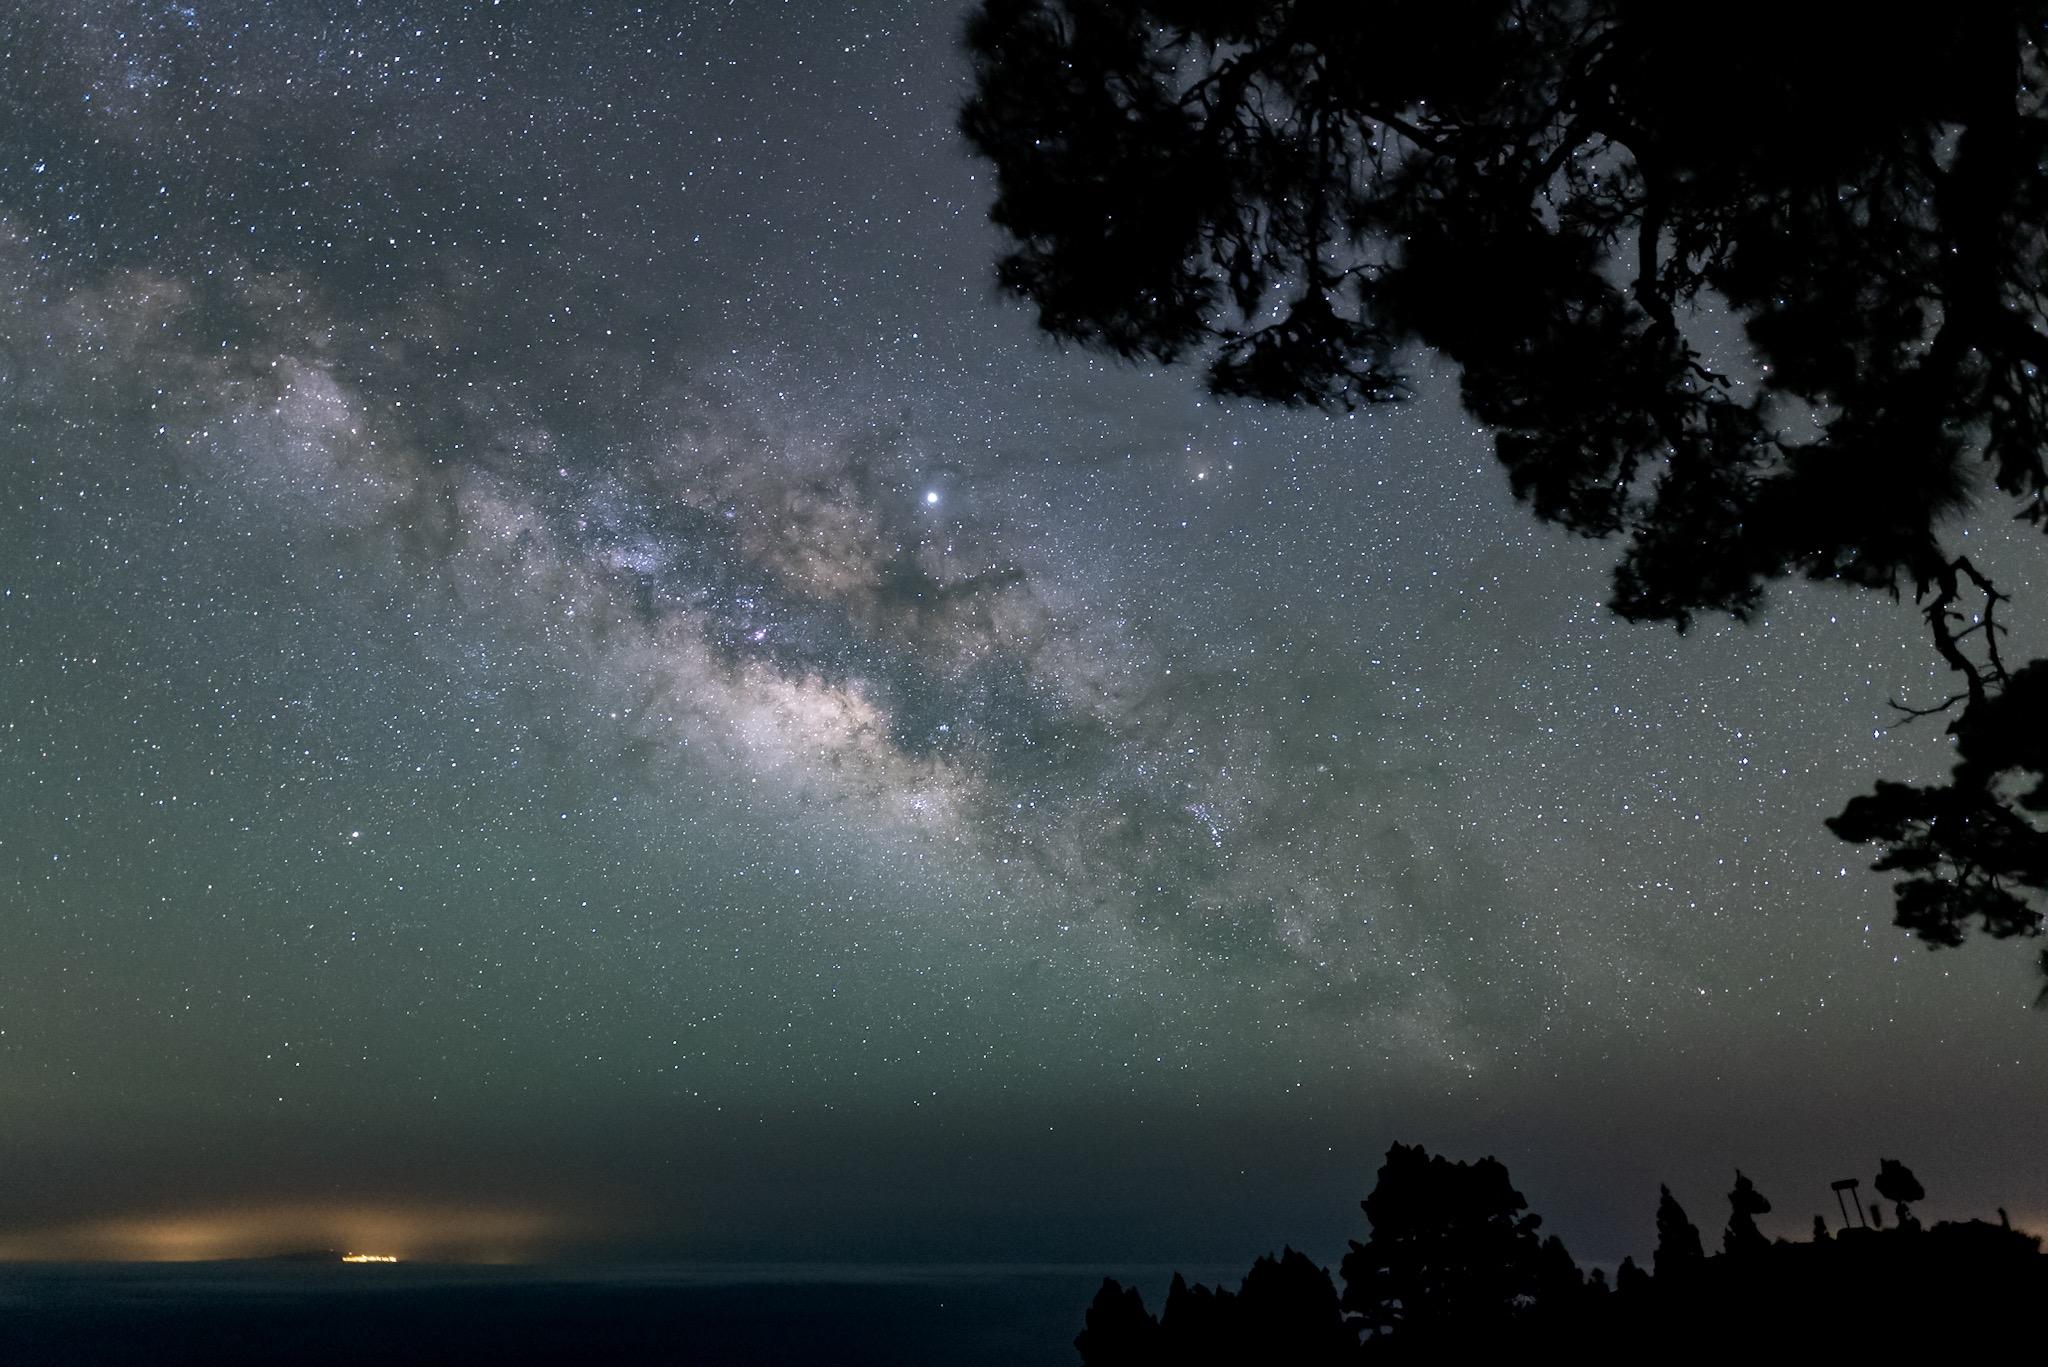 Canary Islands Milky Way